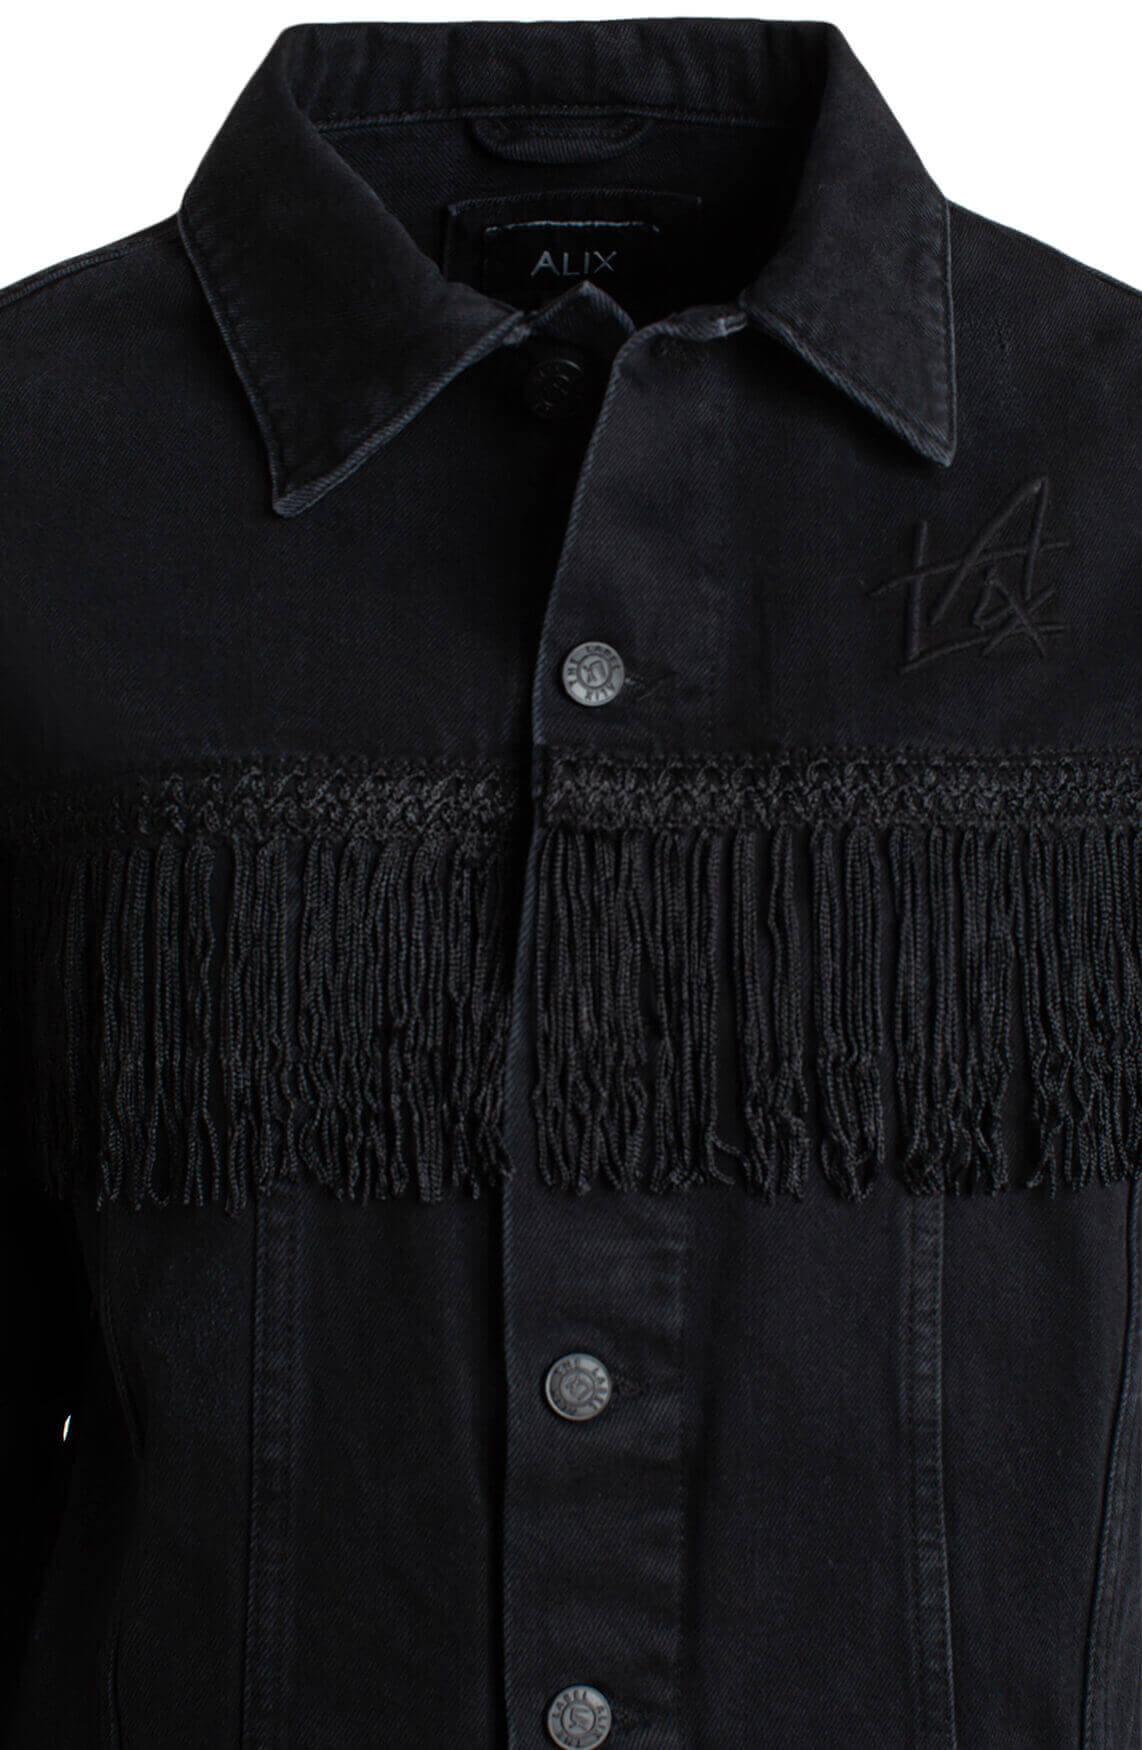 Alix The Label Dames Denim jack met franjes zwart